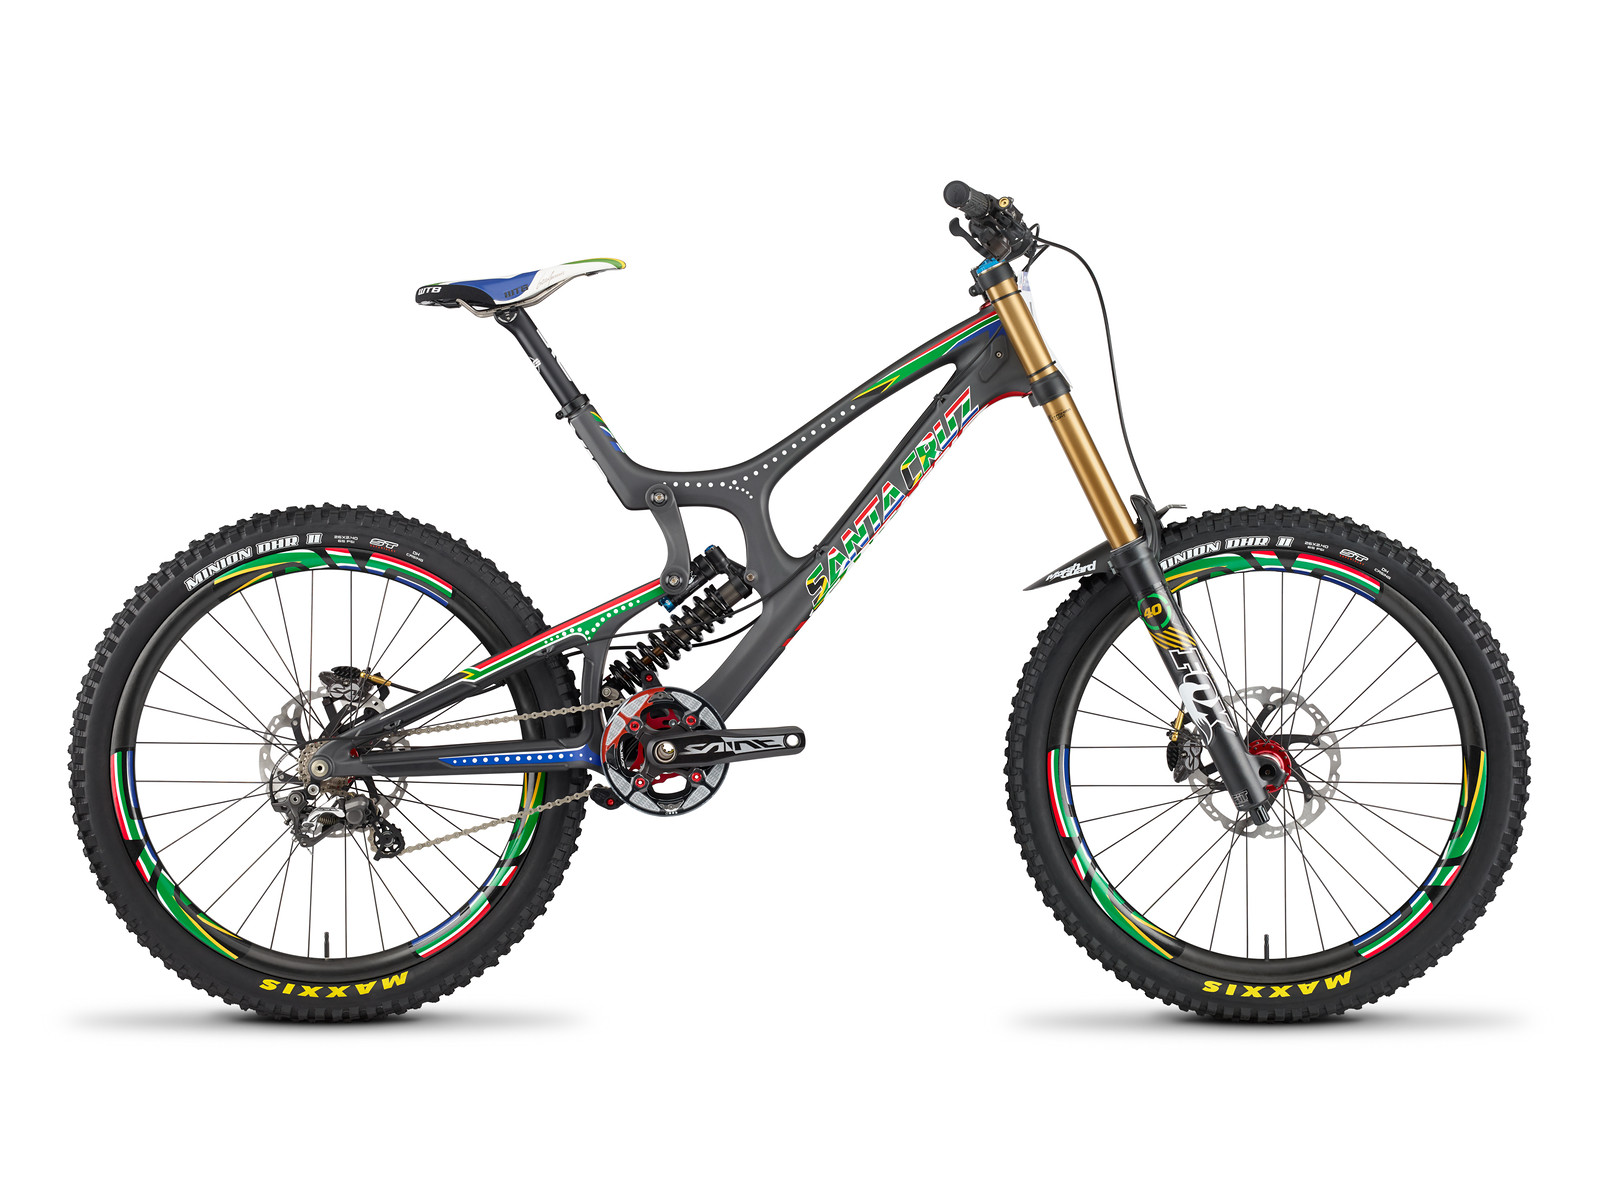 Santa Cruz V10 Limited Edition Minnaar Replica - iceman2058 - Mountain Biking Pictures - Vital MTB